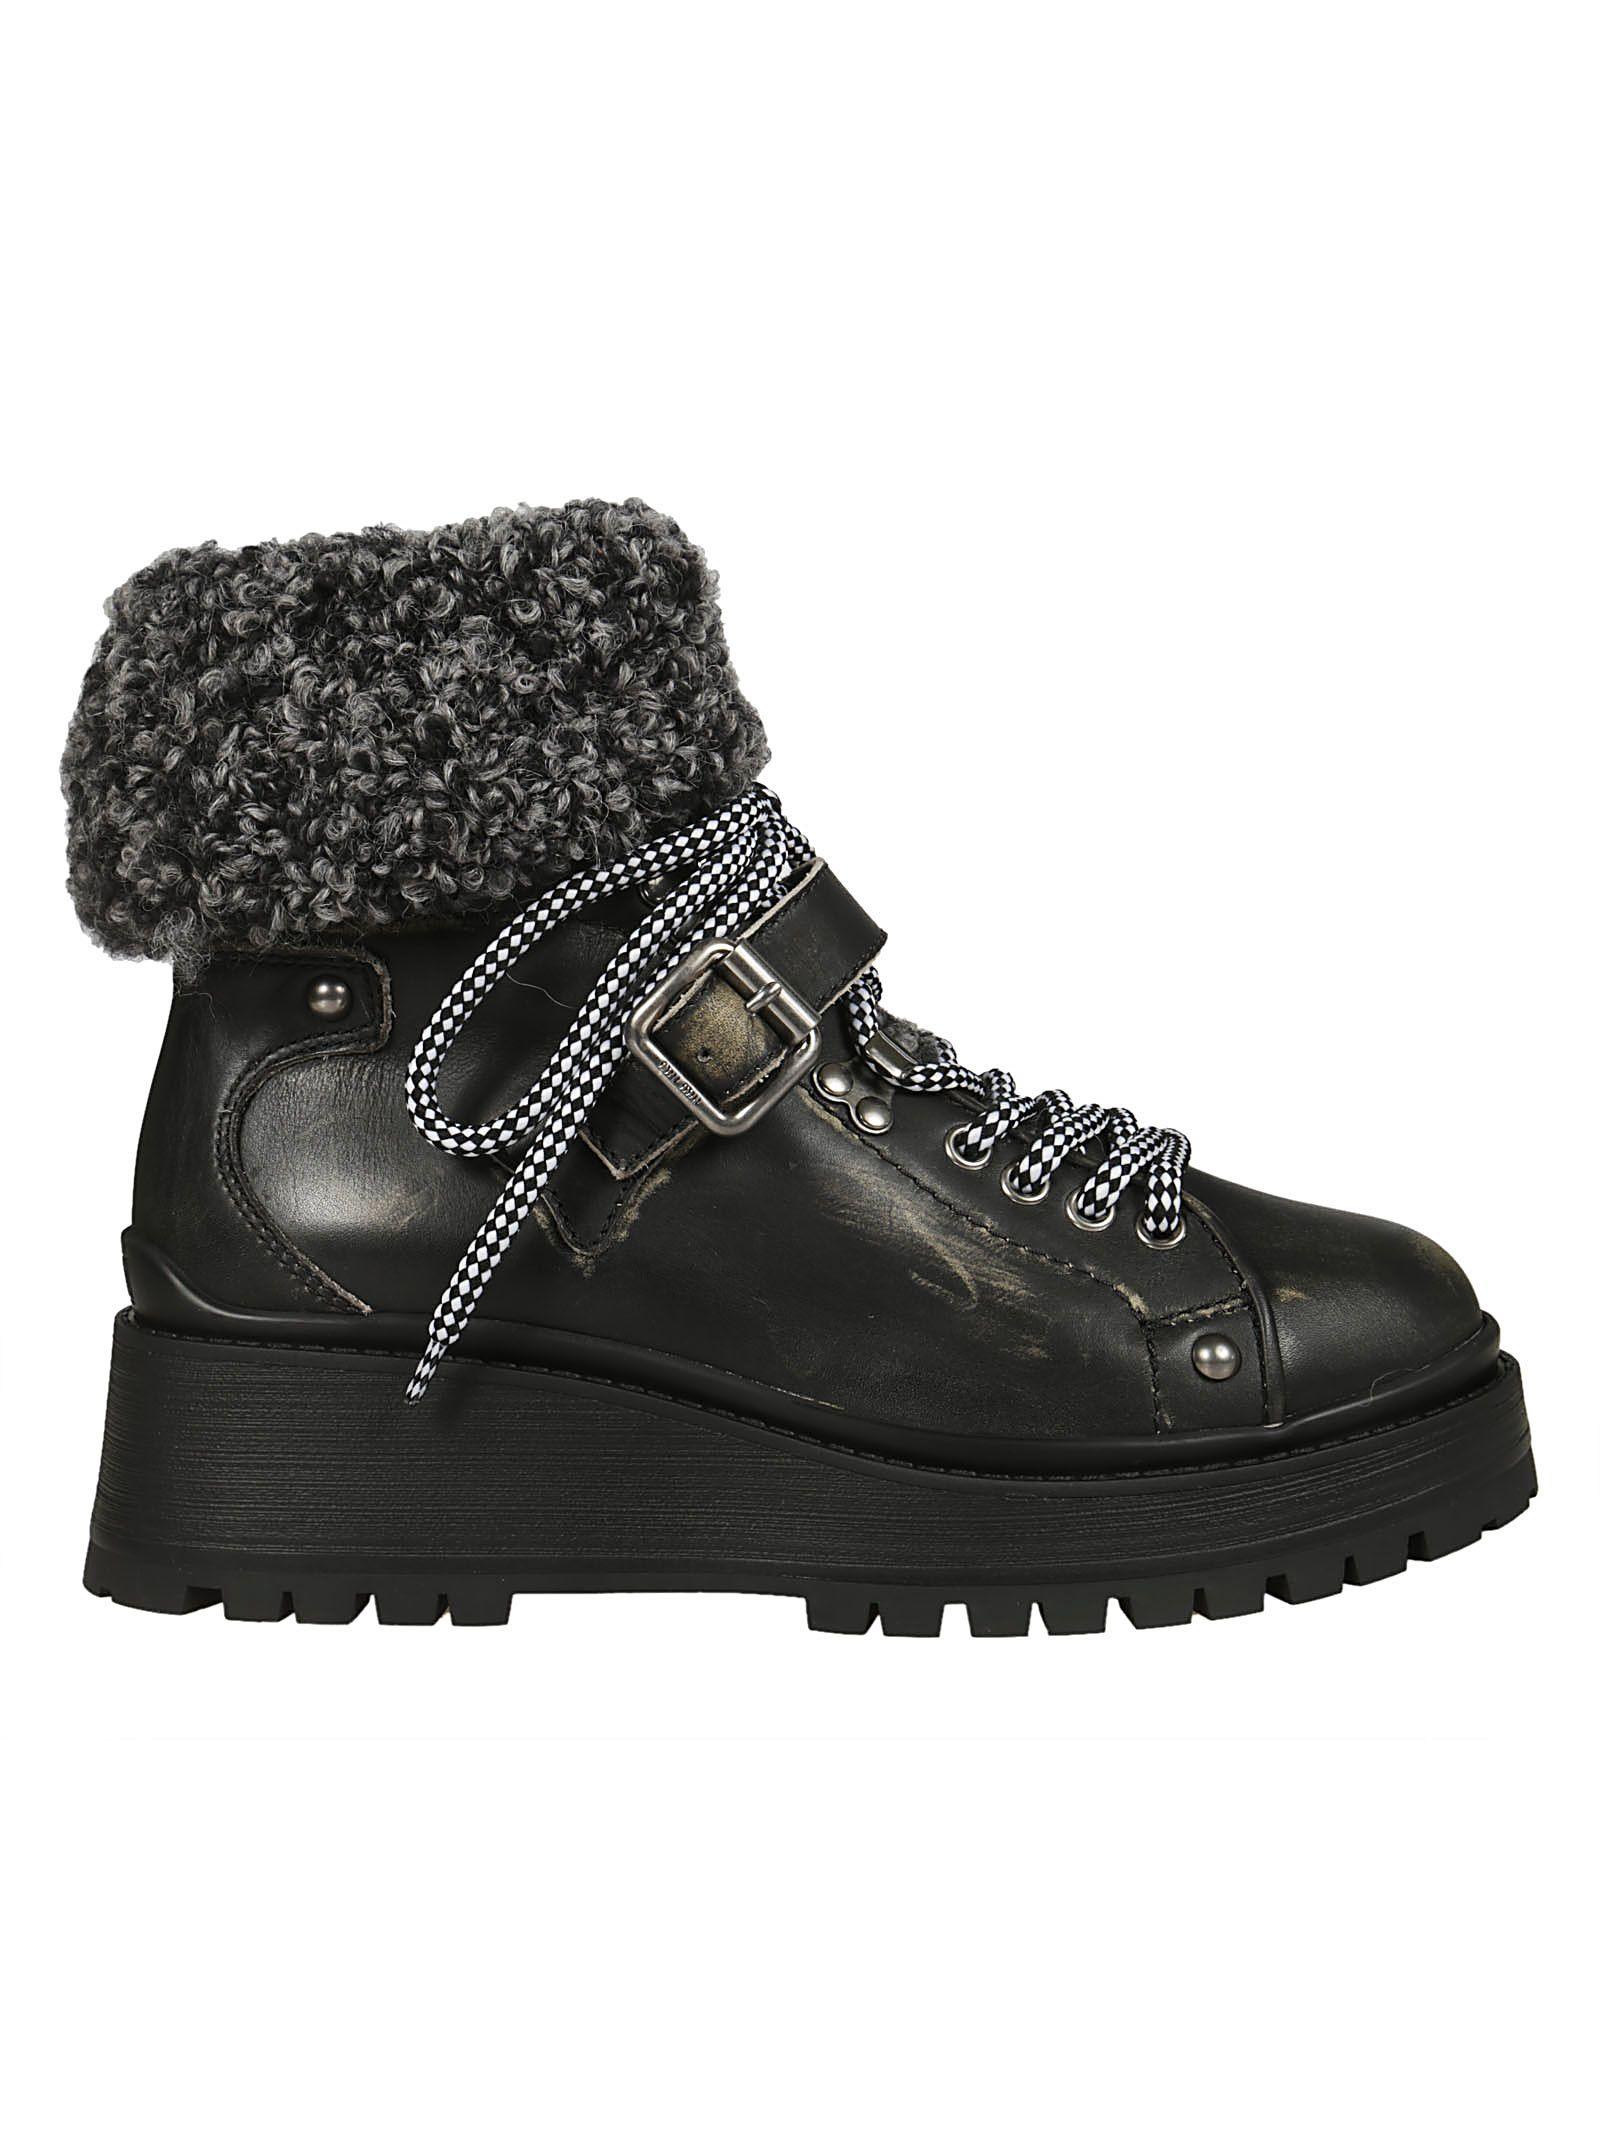 miu miu -  Fur Detail Boots